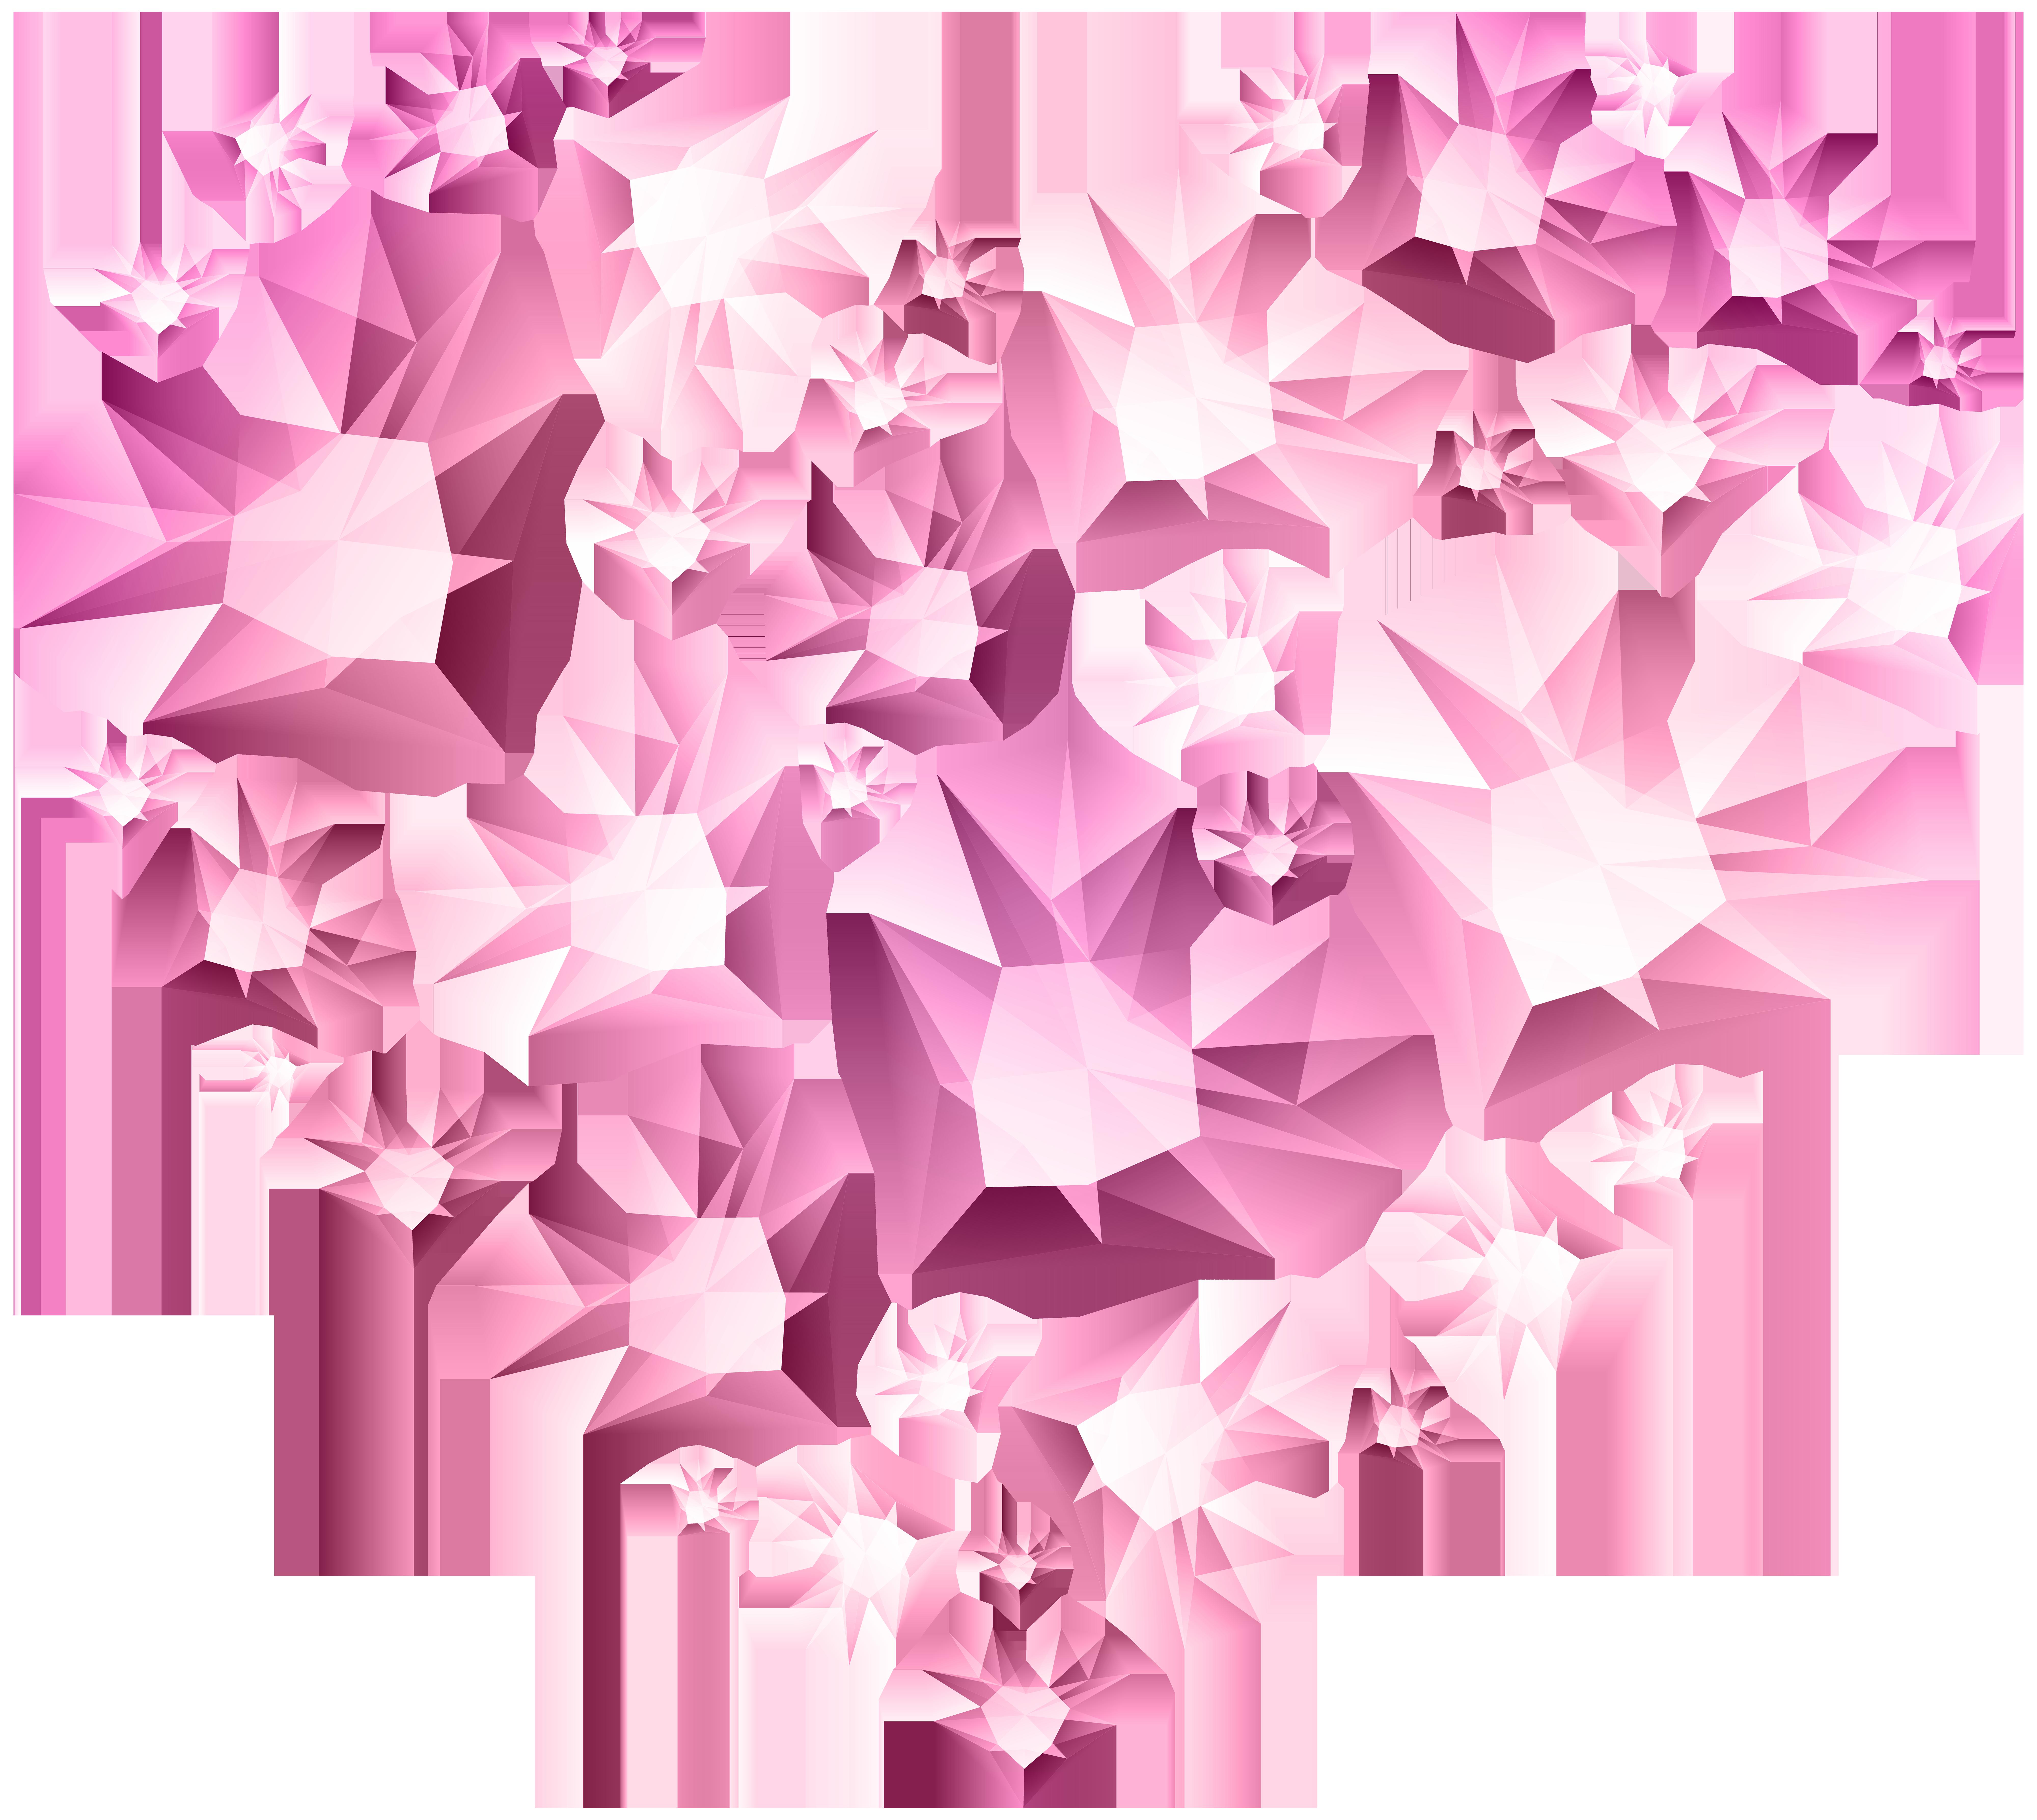 Clipart diamond bunch. Hert of hearts transparent